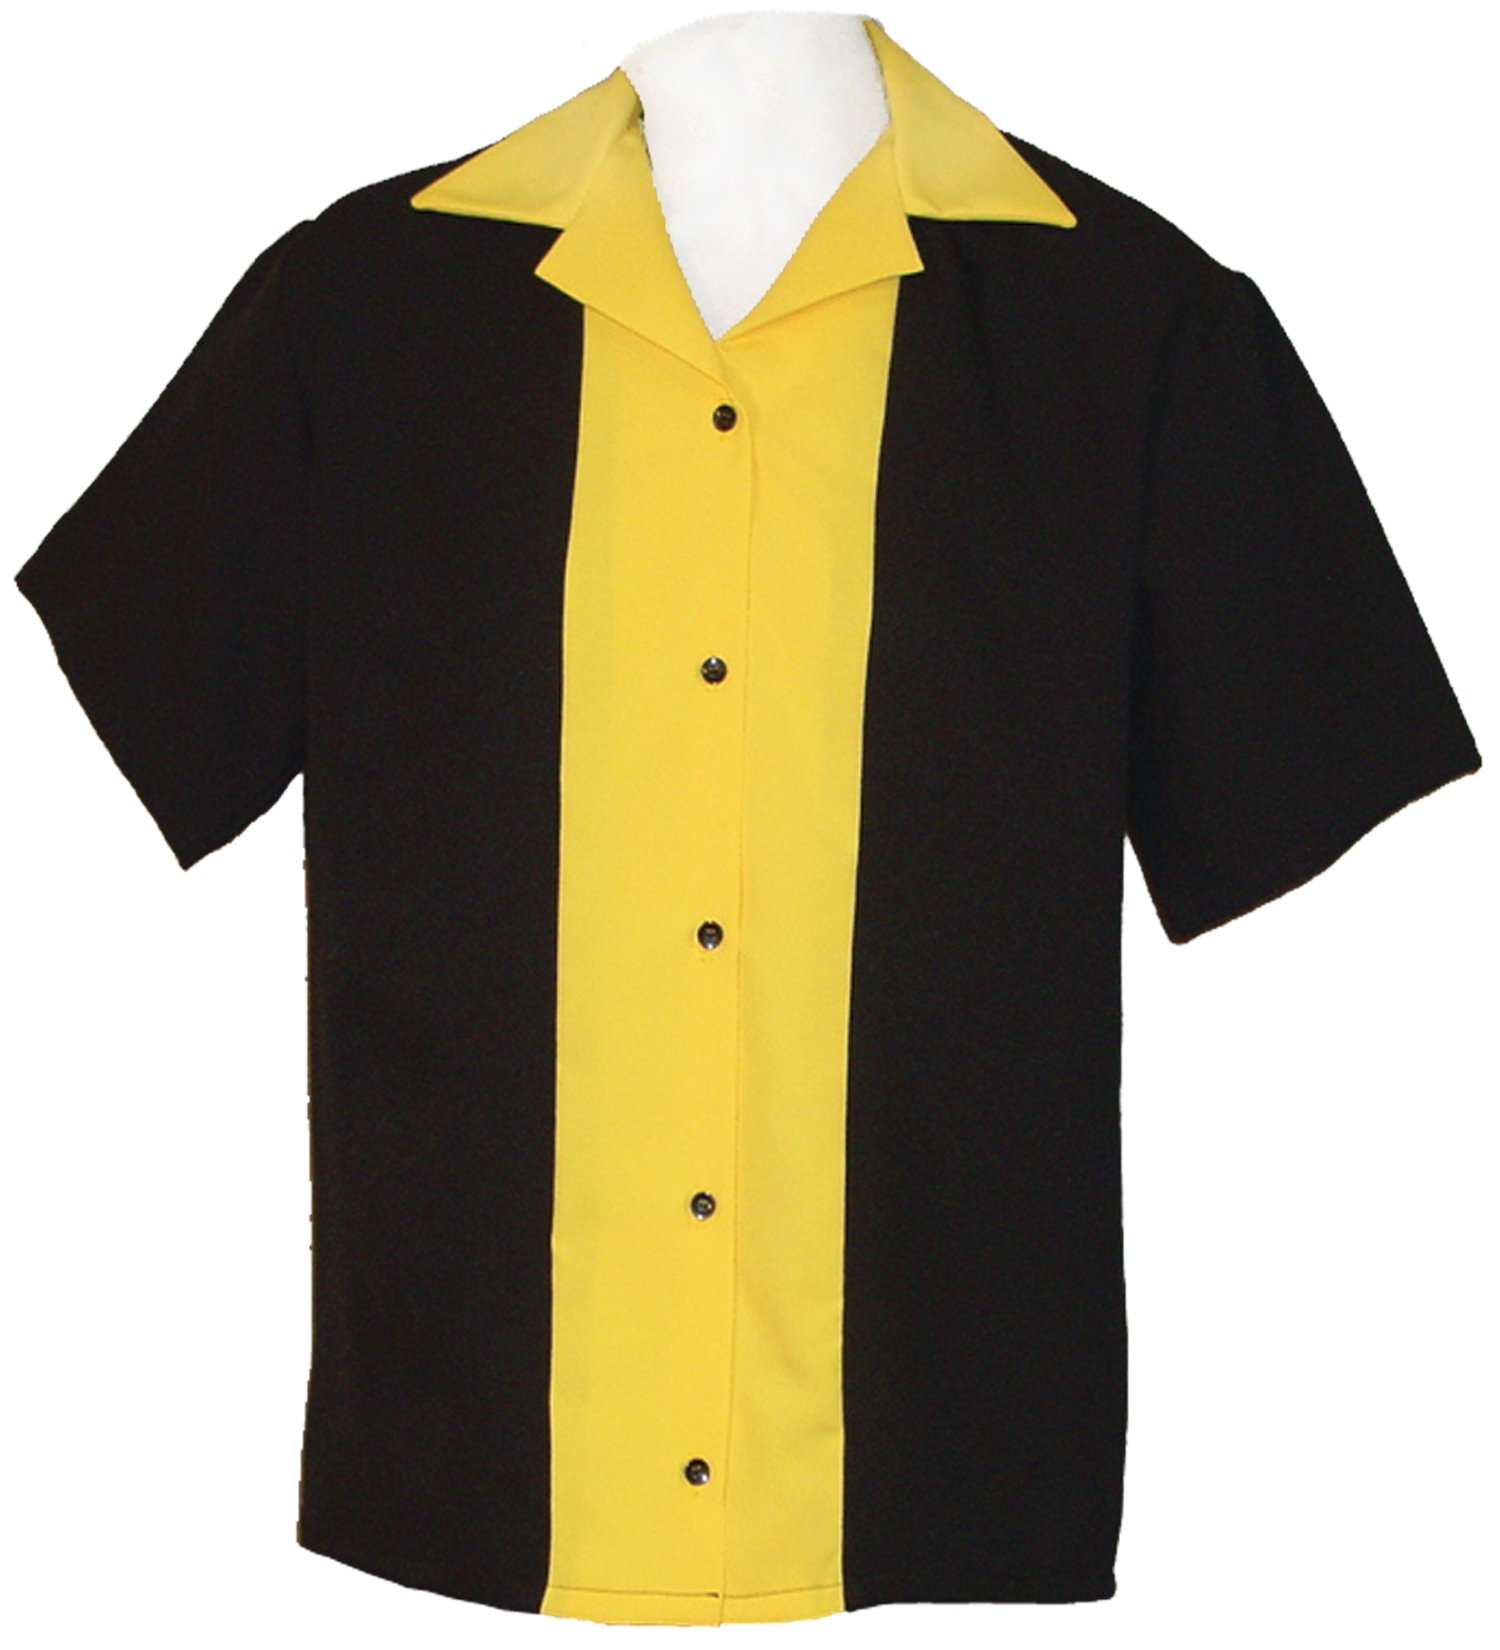 Tutti Ladies Retro Bowling Shirt 50's Style Classic 57 Womens Bowling Shirts (Small) Yellow